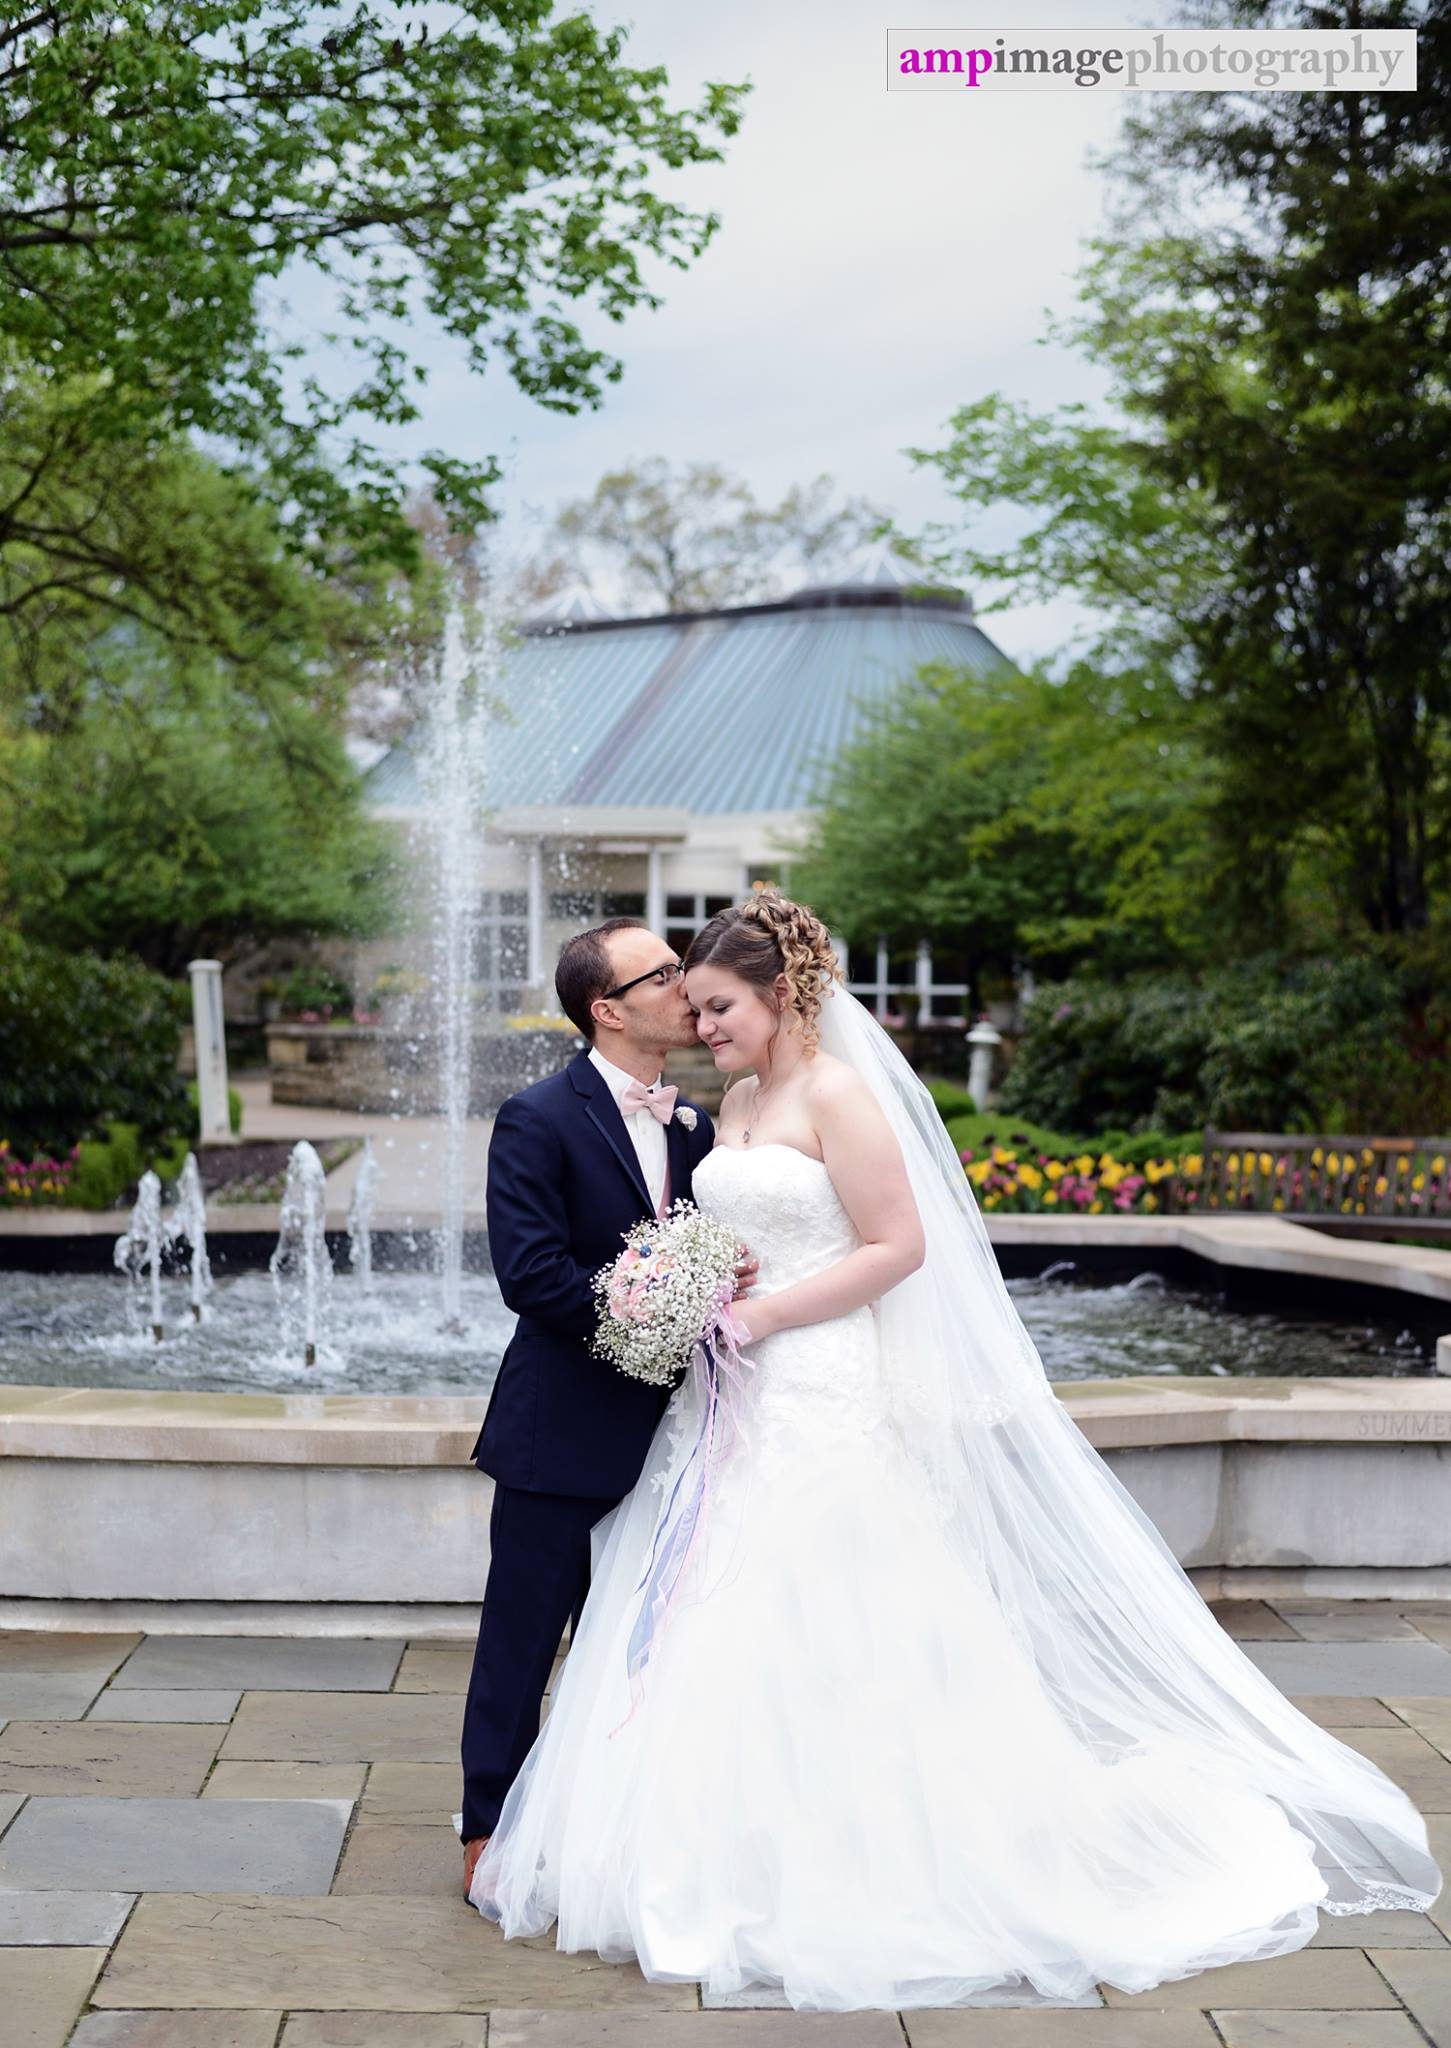 Kimberly & Michael | Wedding | Victory Christian Center | Fellows Riverside Gardens | The Embassy | Youngstown Wedding Photographer